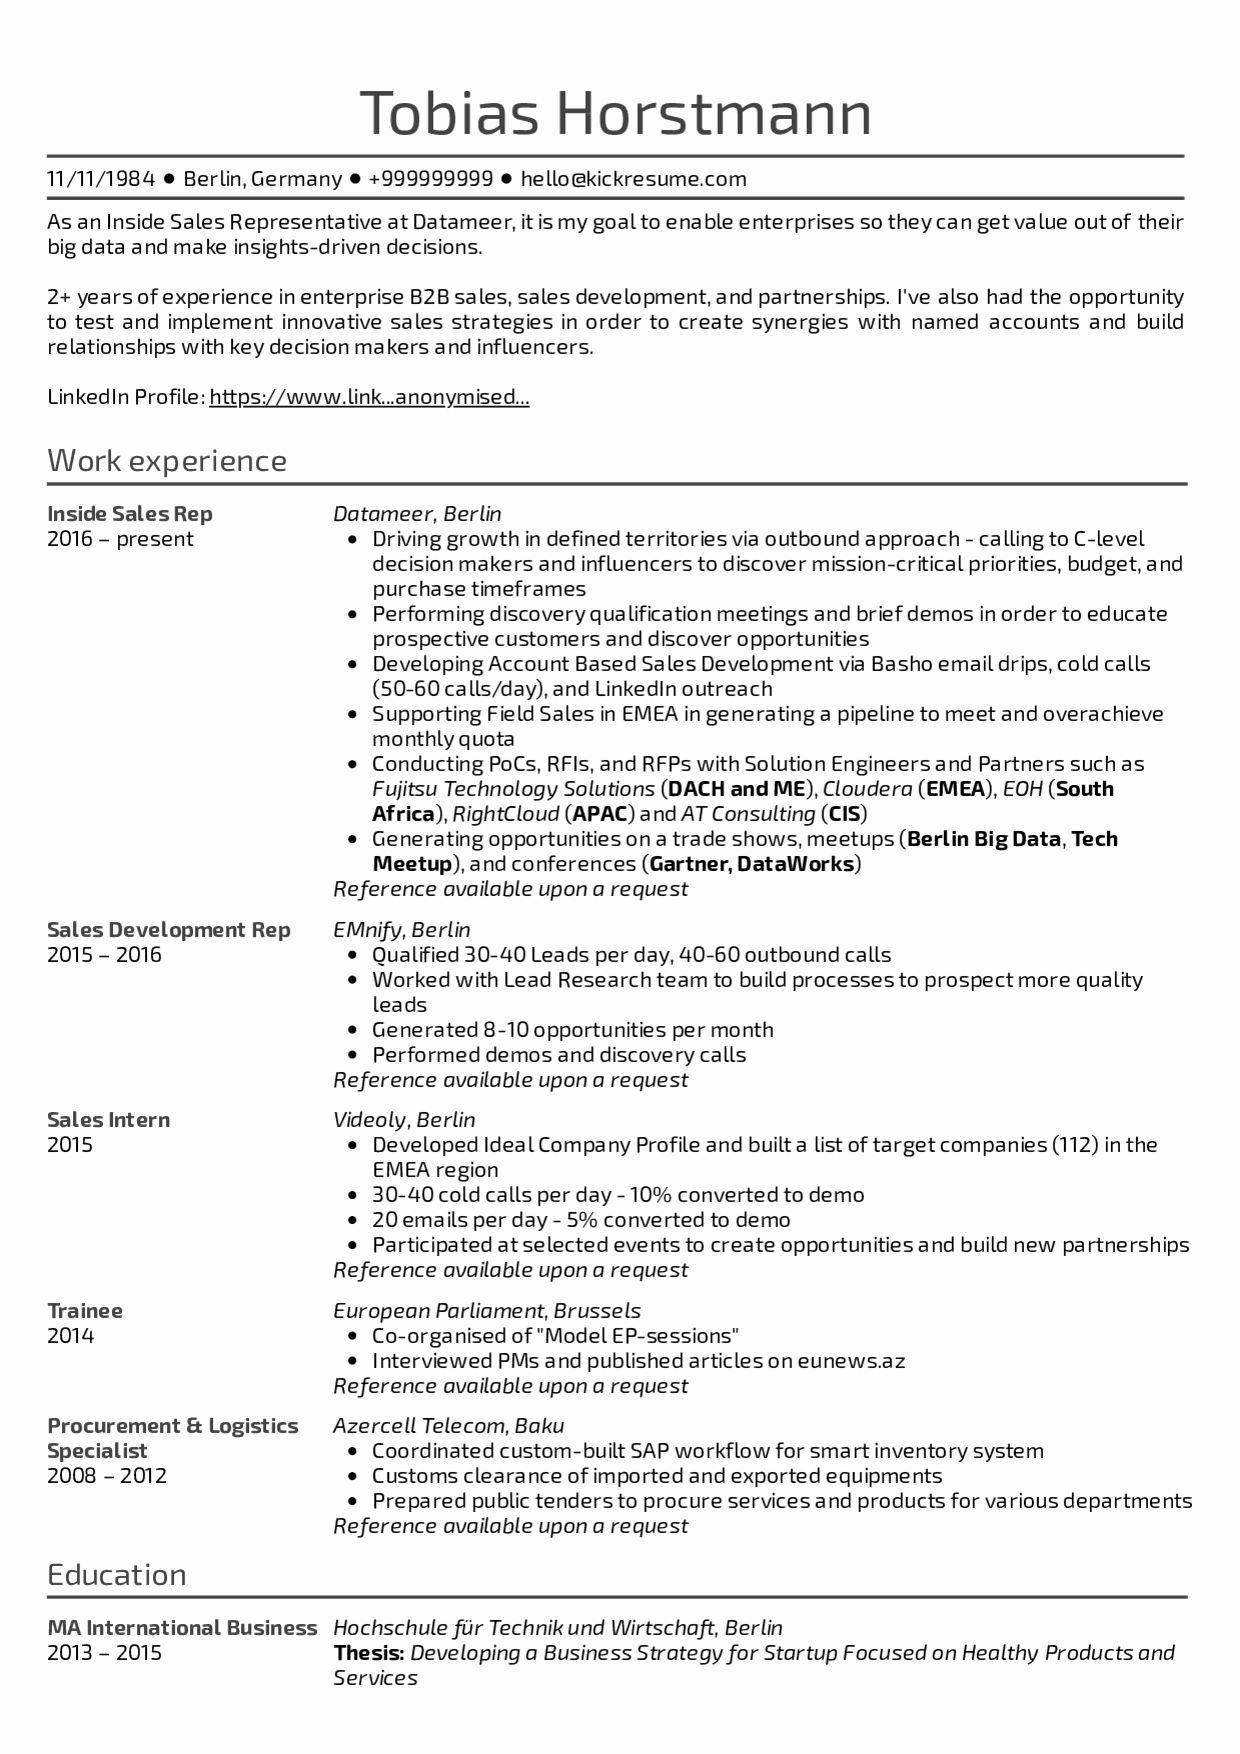 Skills On Resume For Sales